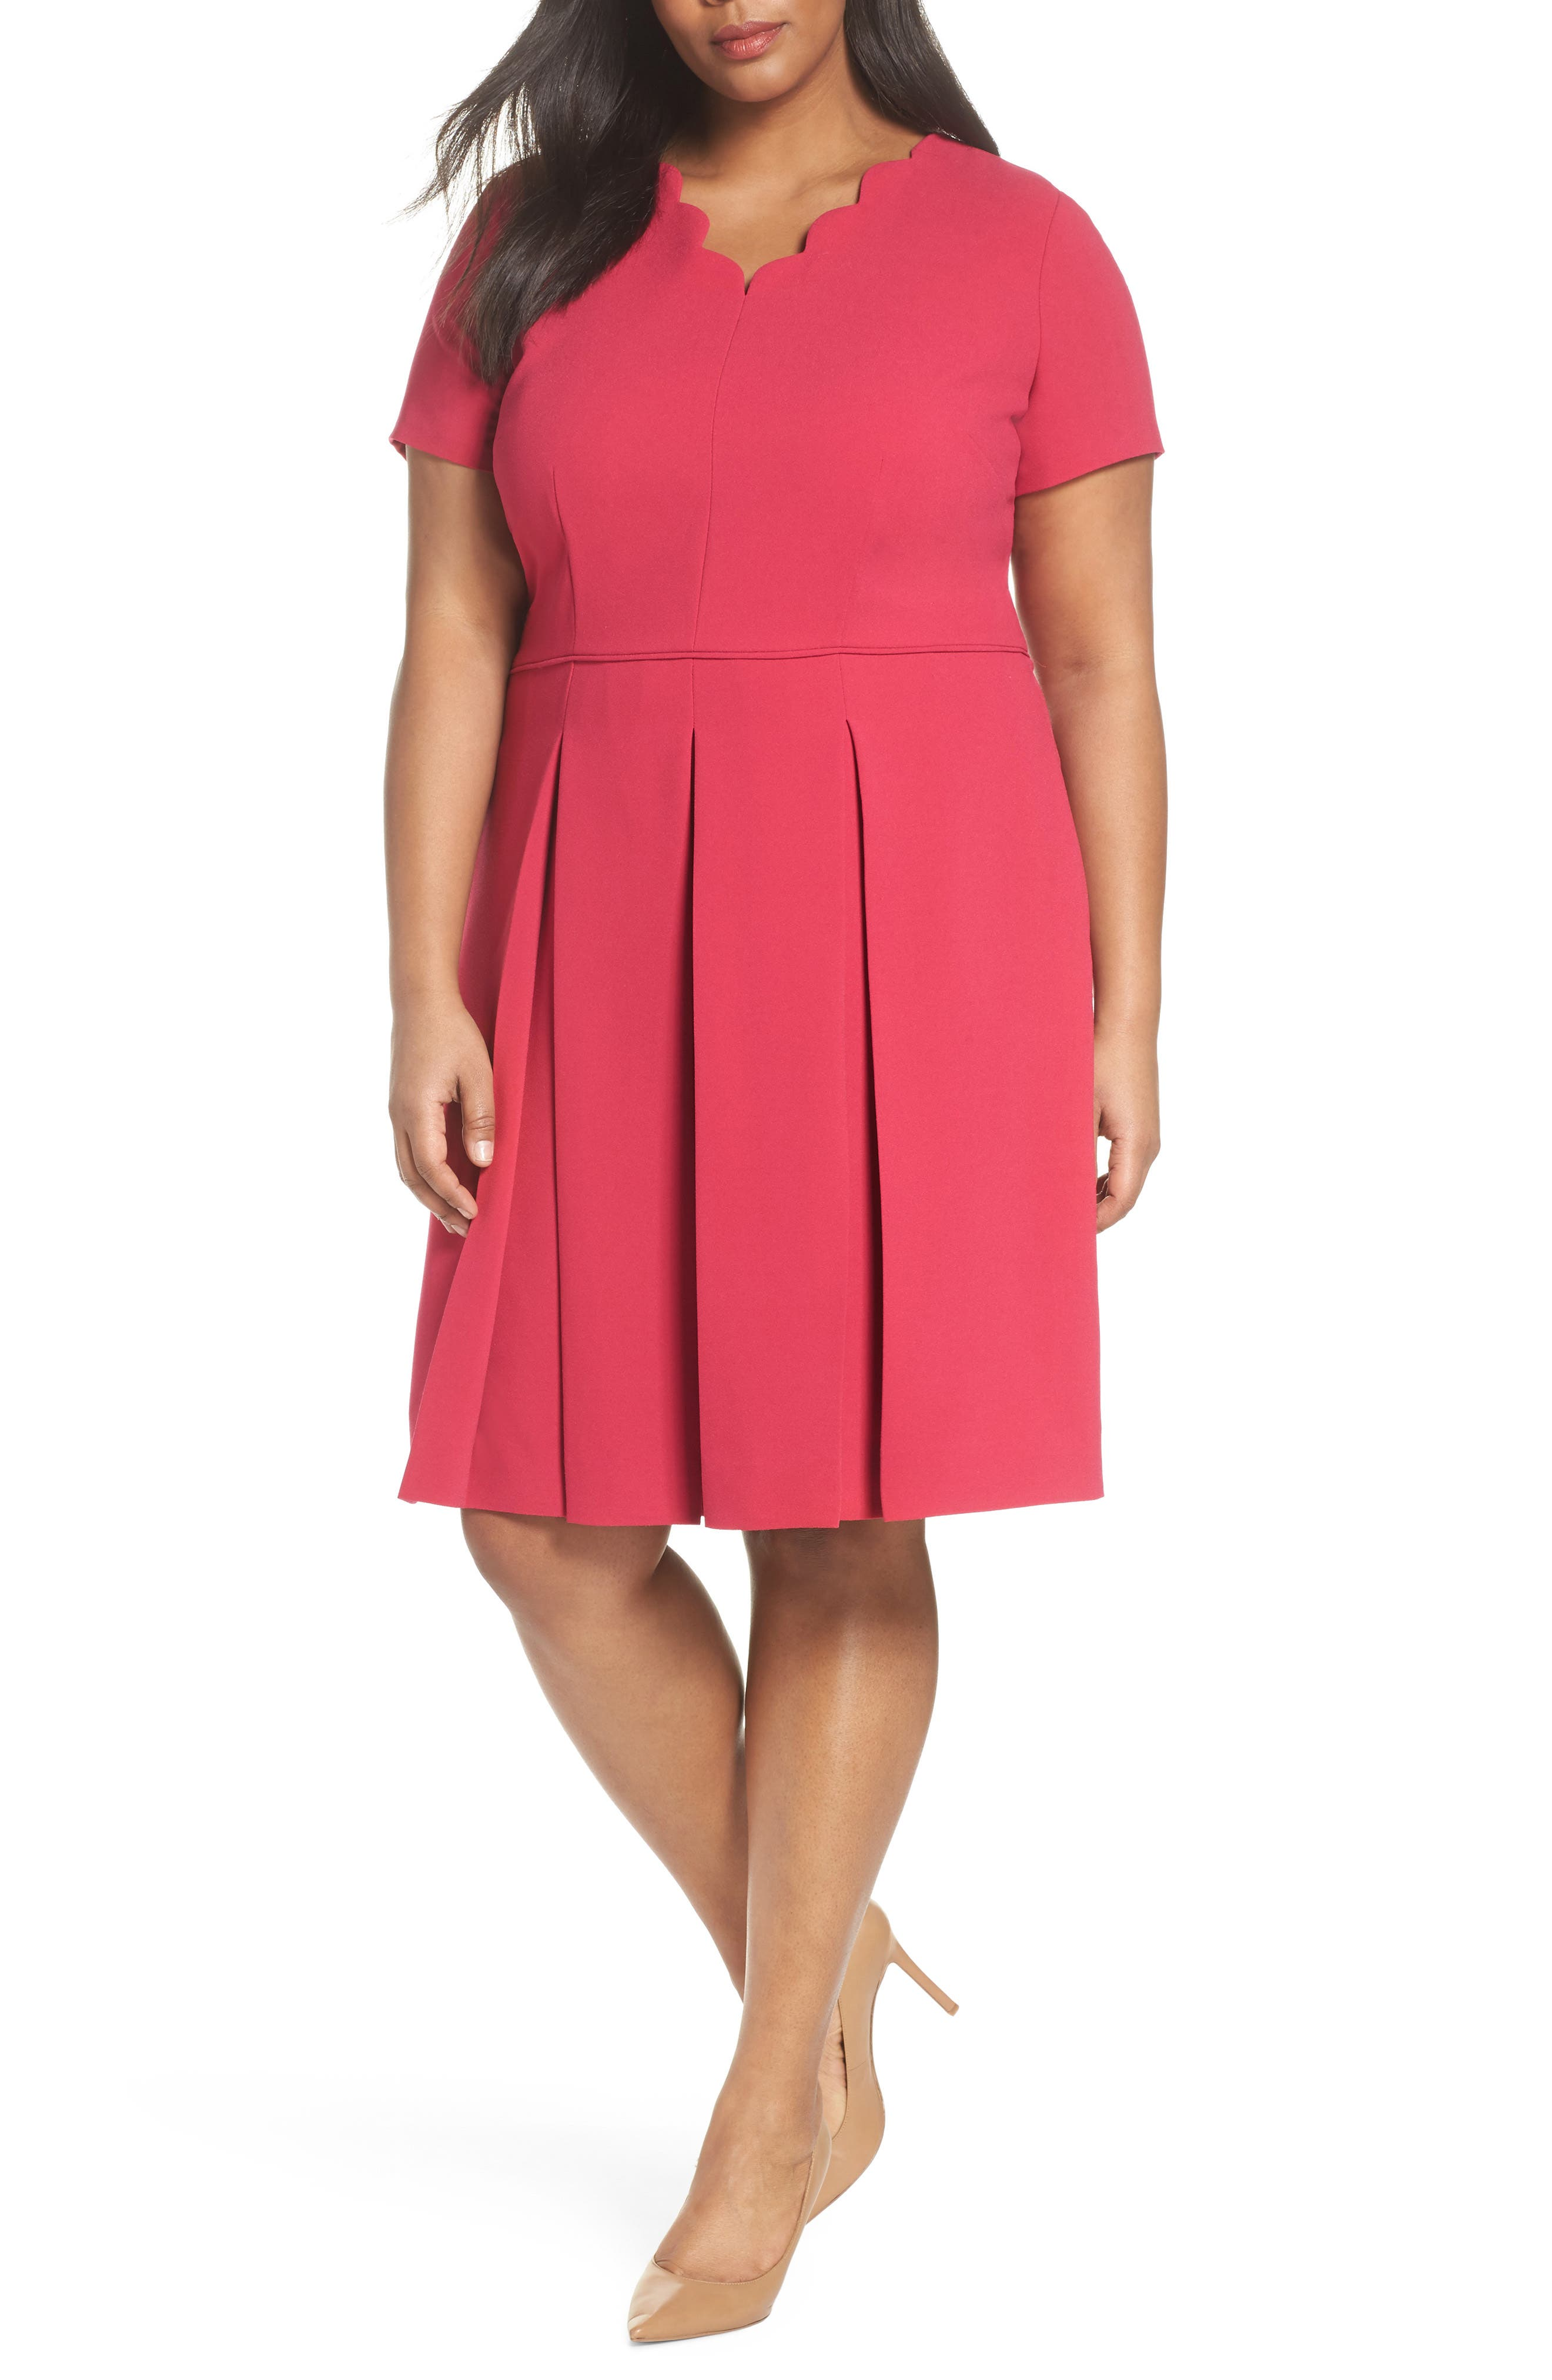 Main Image - Tahari Scallop Neck A-Line Dress (Plus Size)